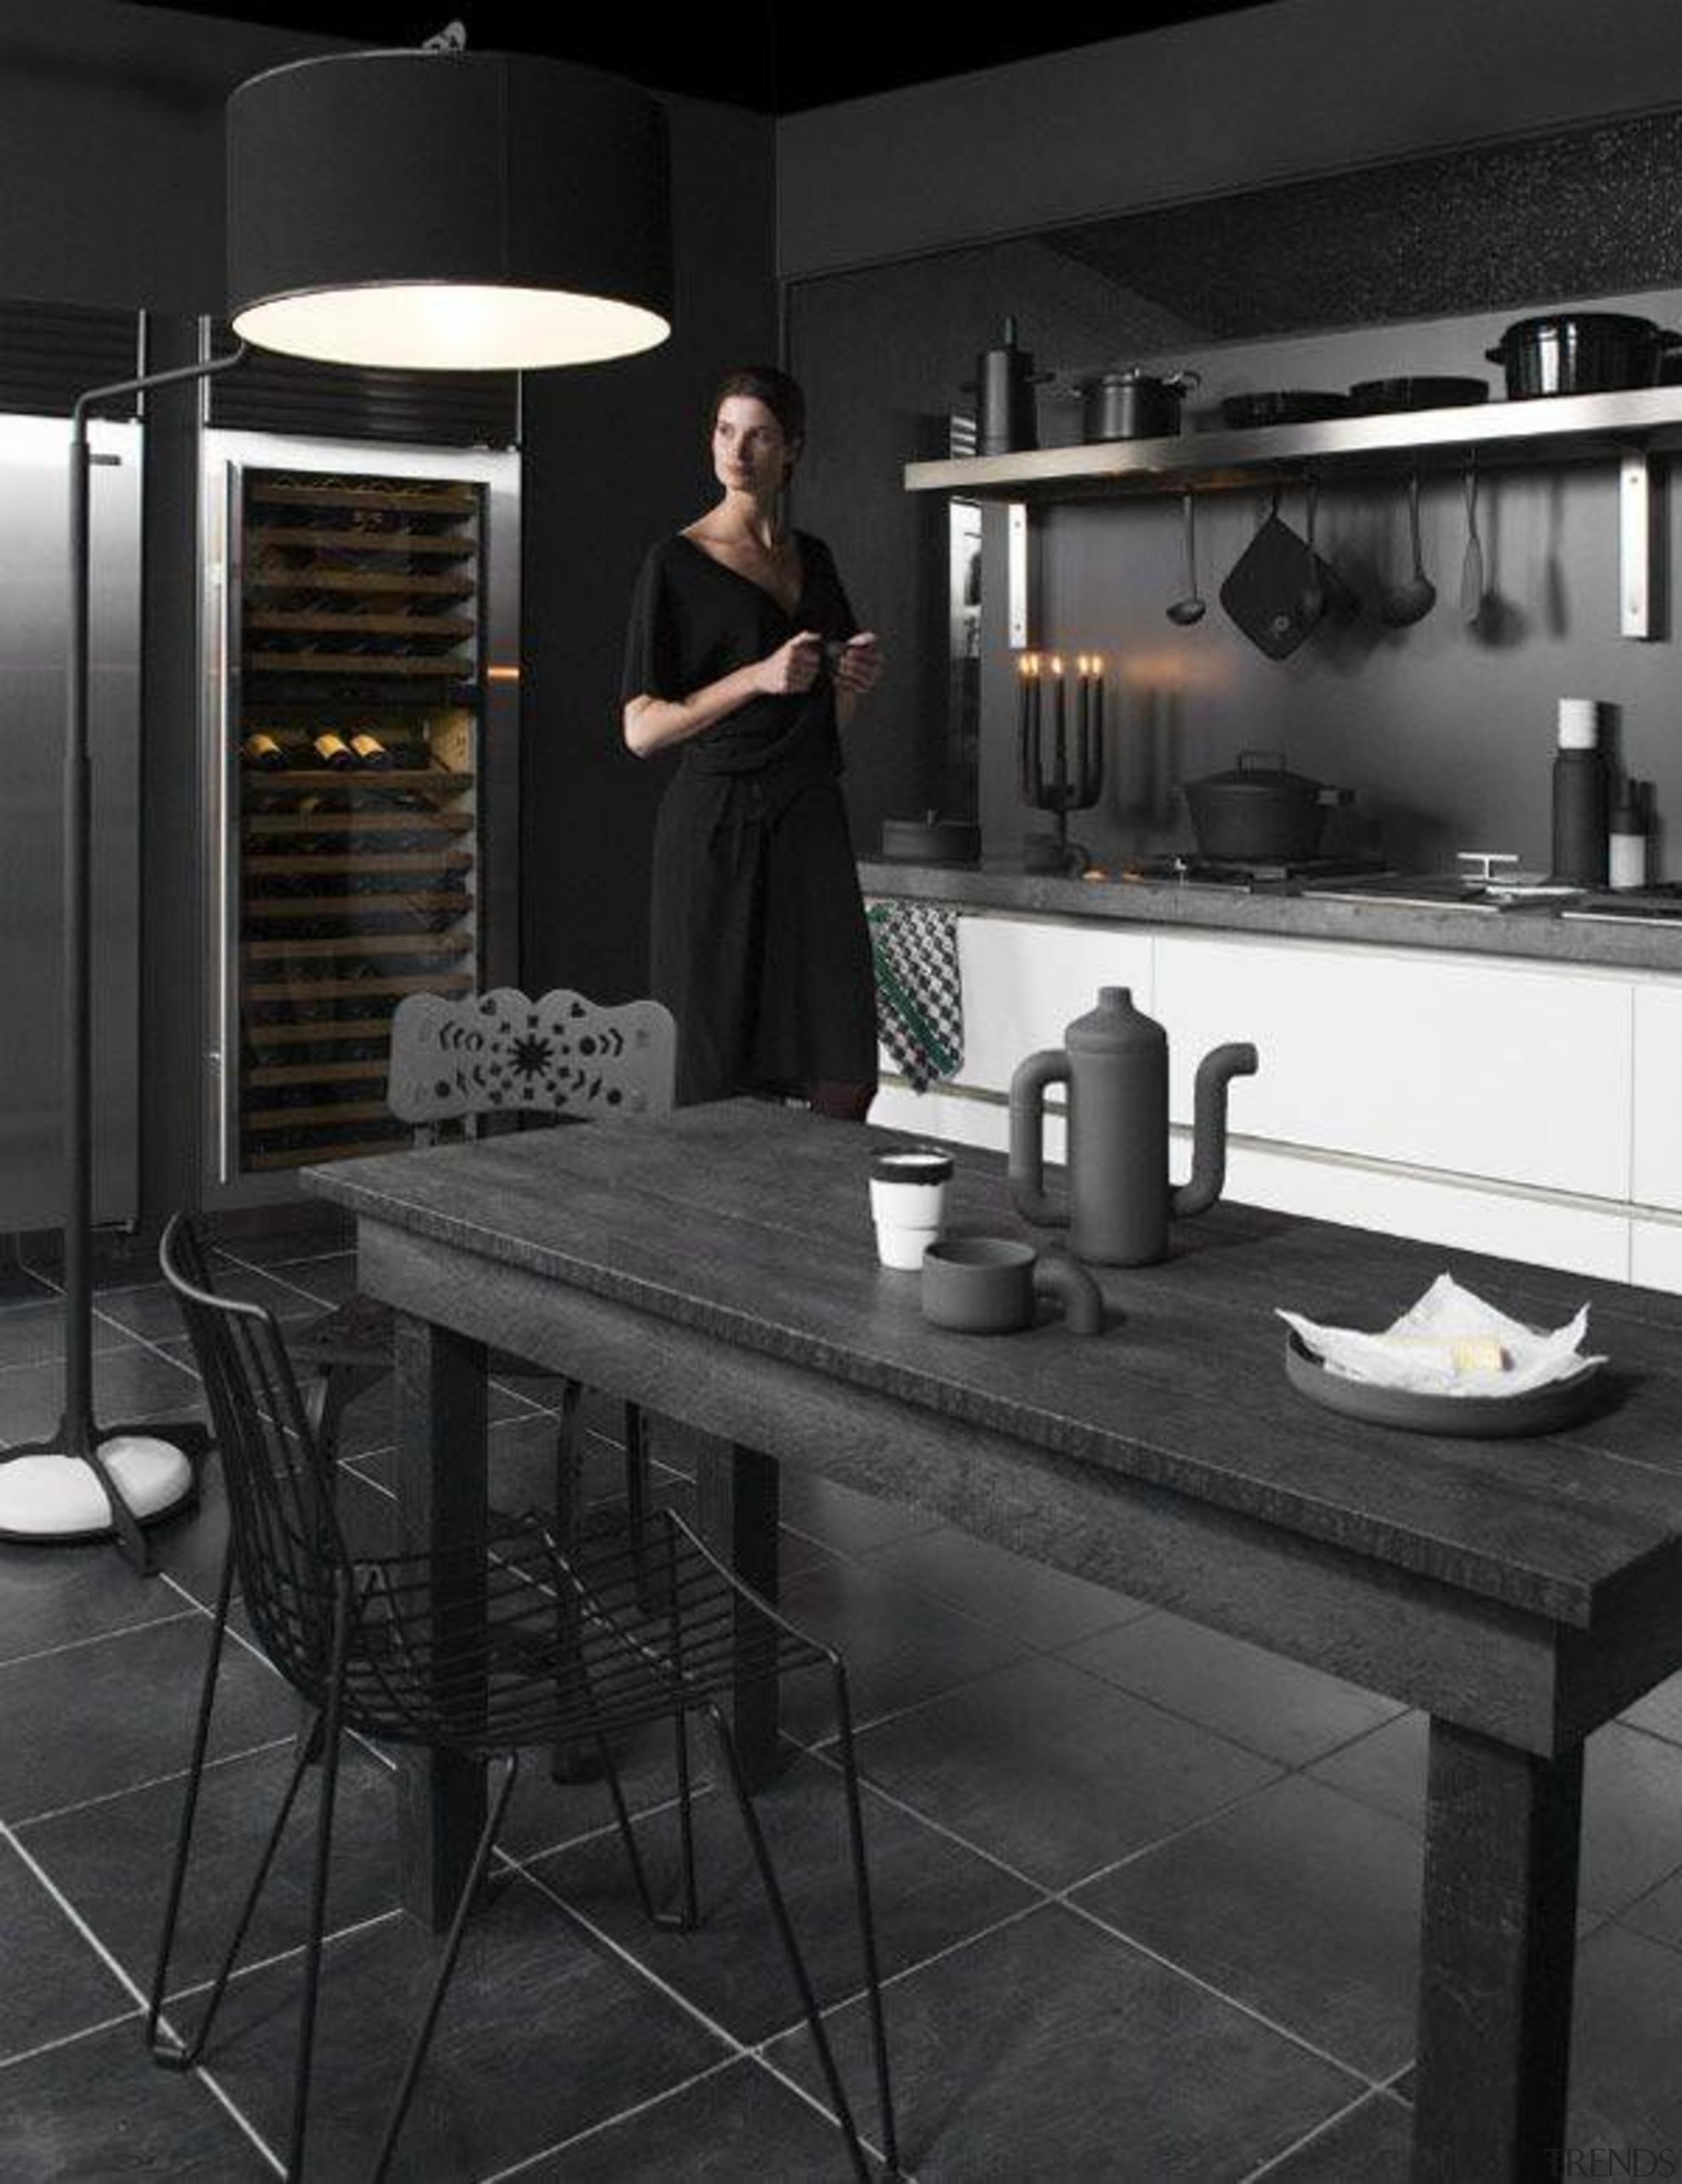 Black Kitchen and Dining Room - (Matte ) black, black and white, countertop, floor, flooring, furniture, interior design, kitchen, room, table, black